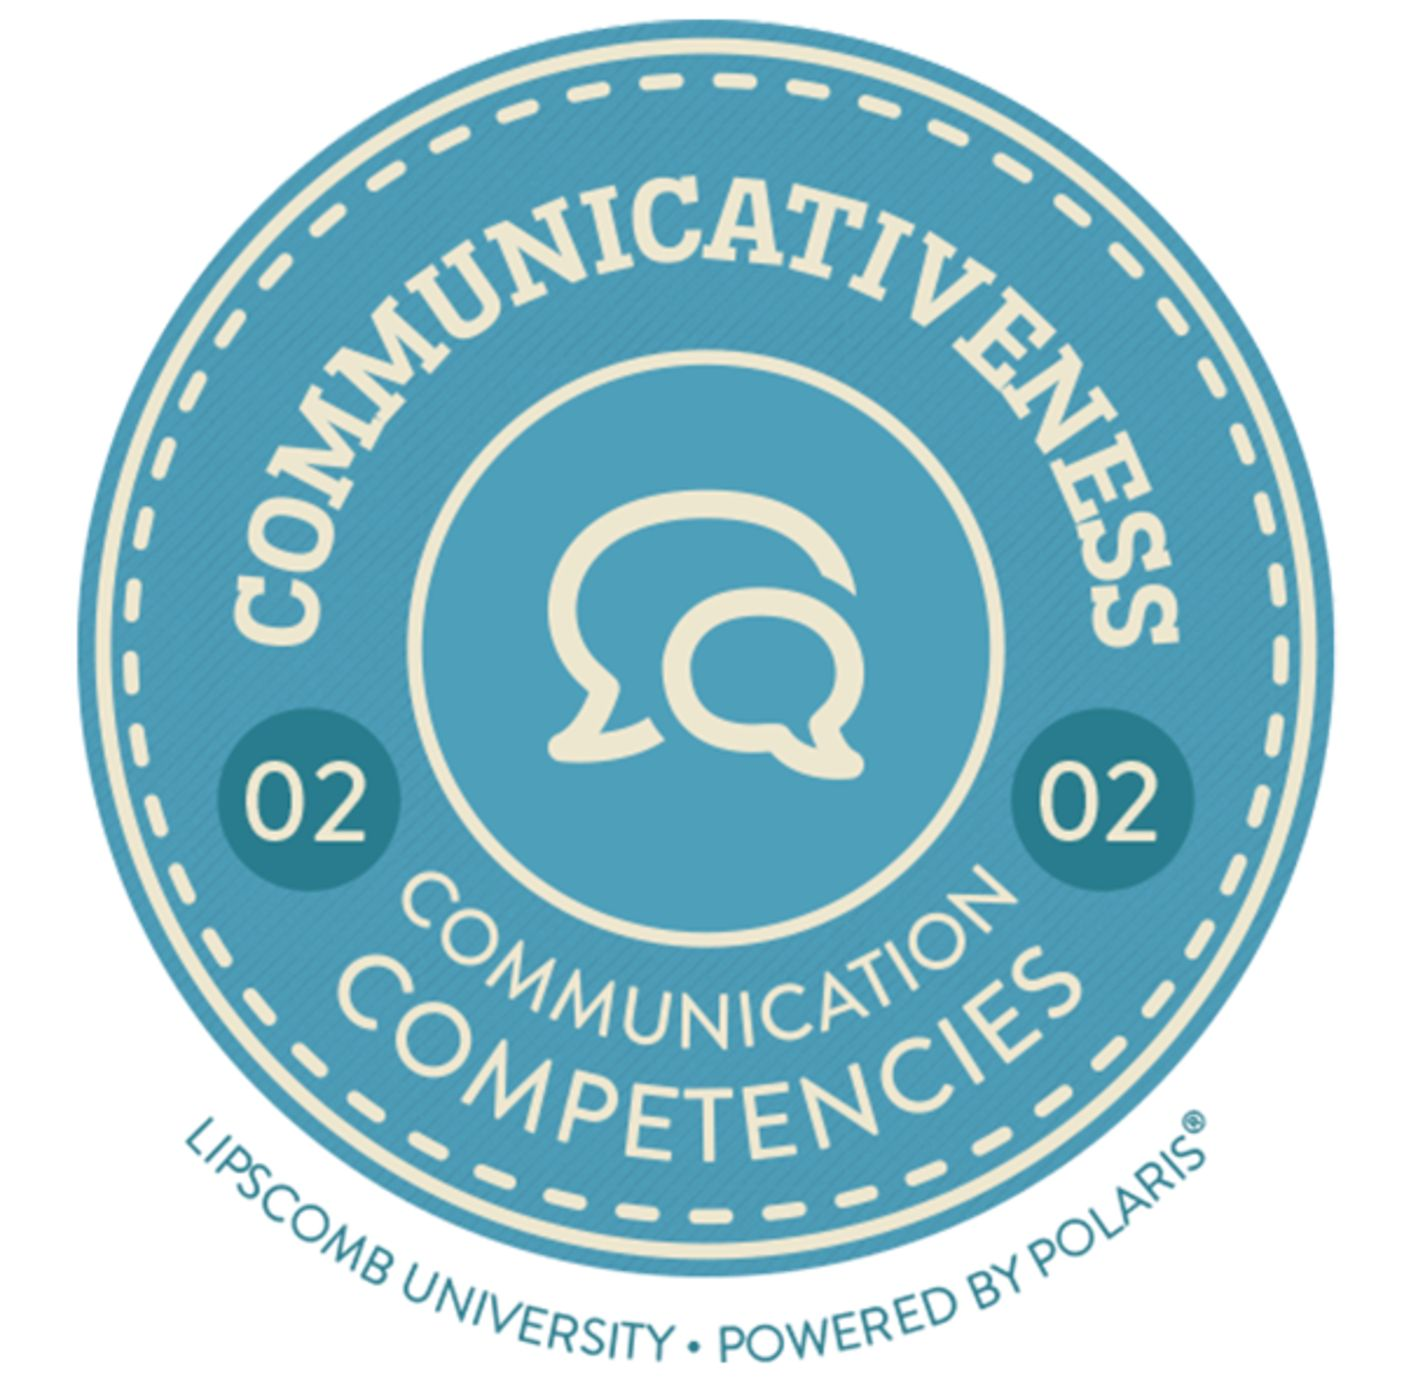 Communicativeness